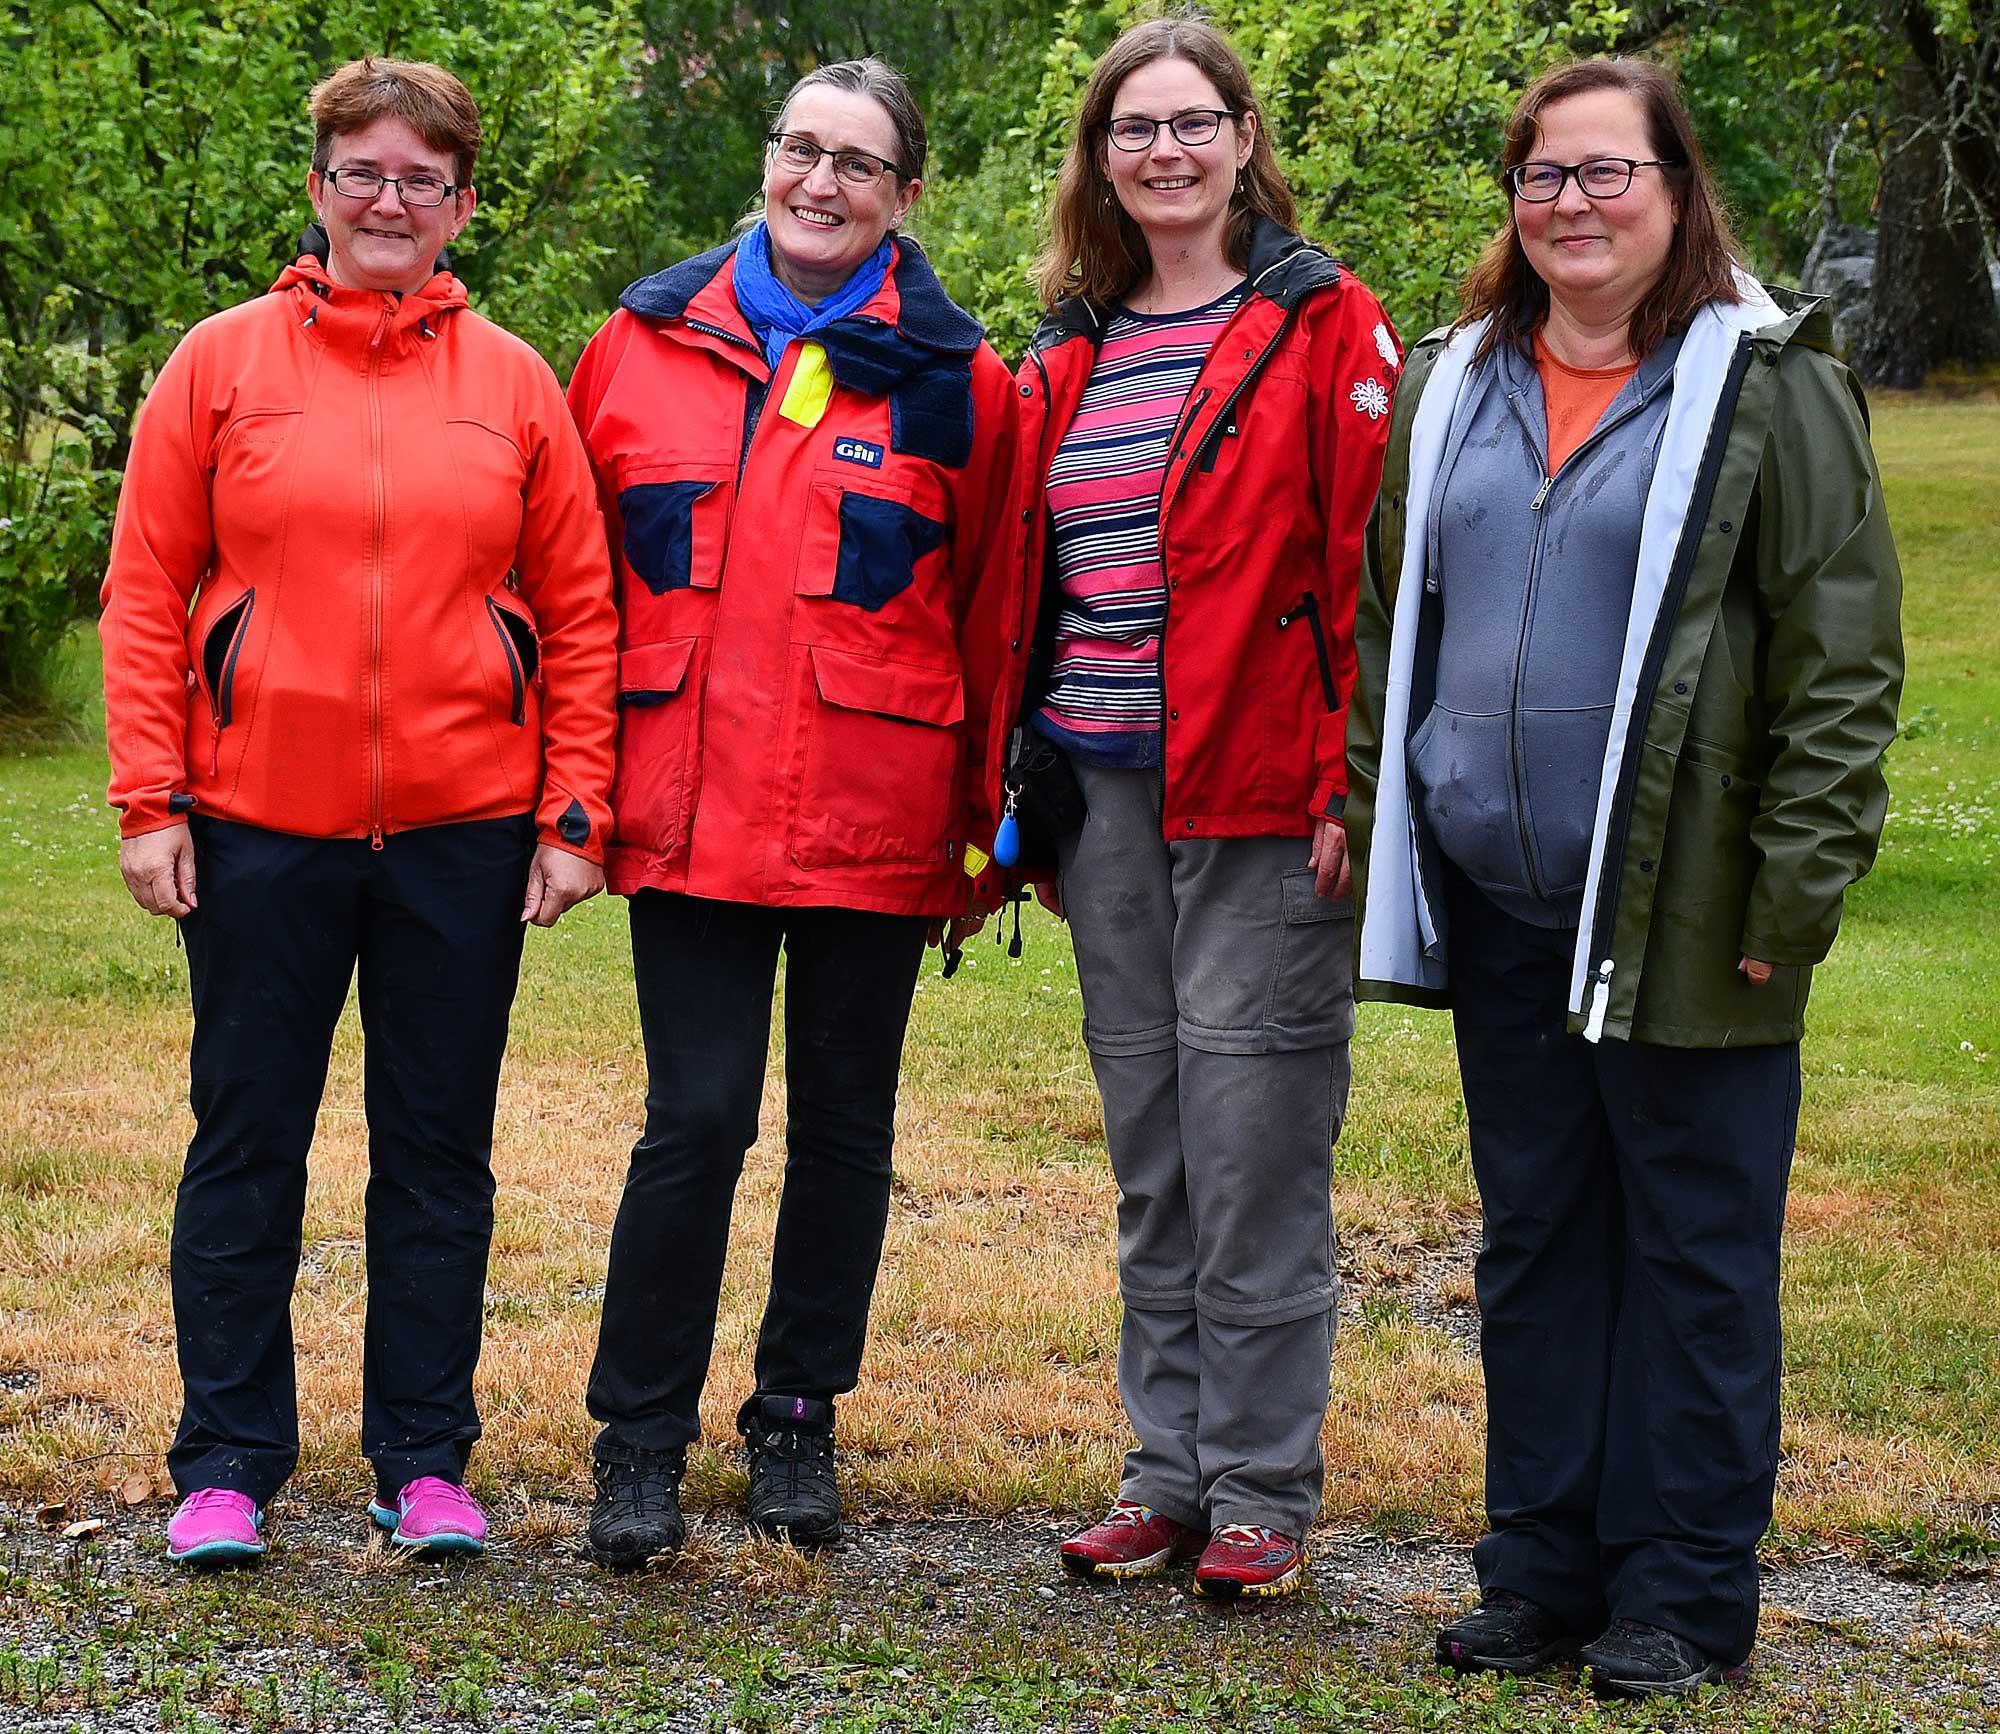 Cornelia Biedermann (ganz links) mit Tarja Karlemo, Mari Ojala und Taina Lestelin (v.l.n.r.).